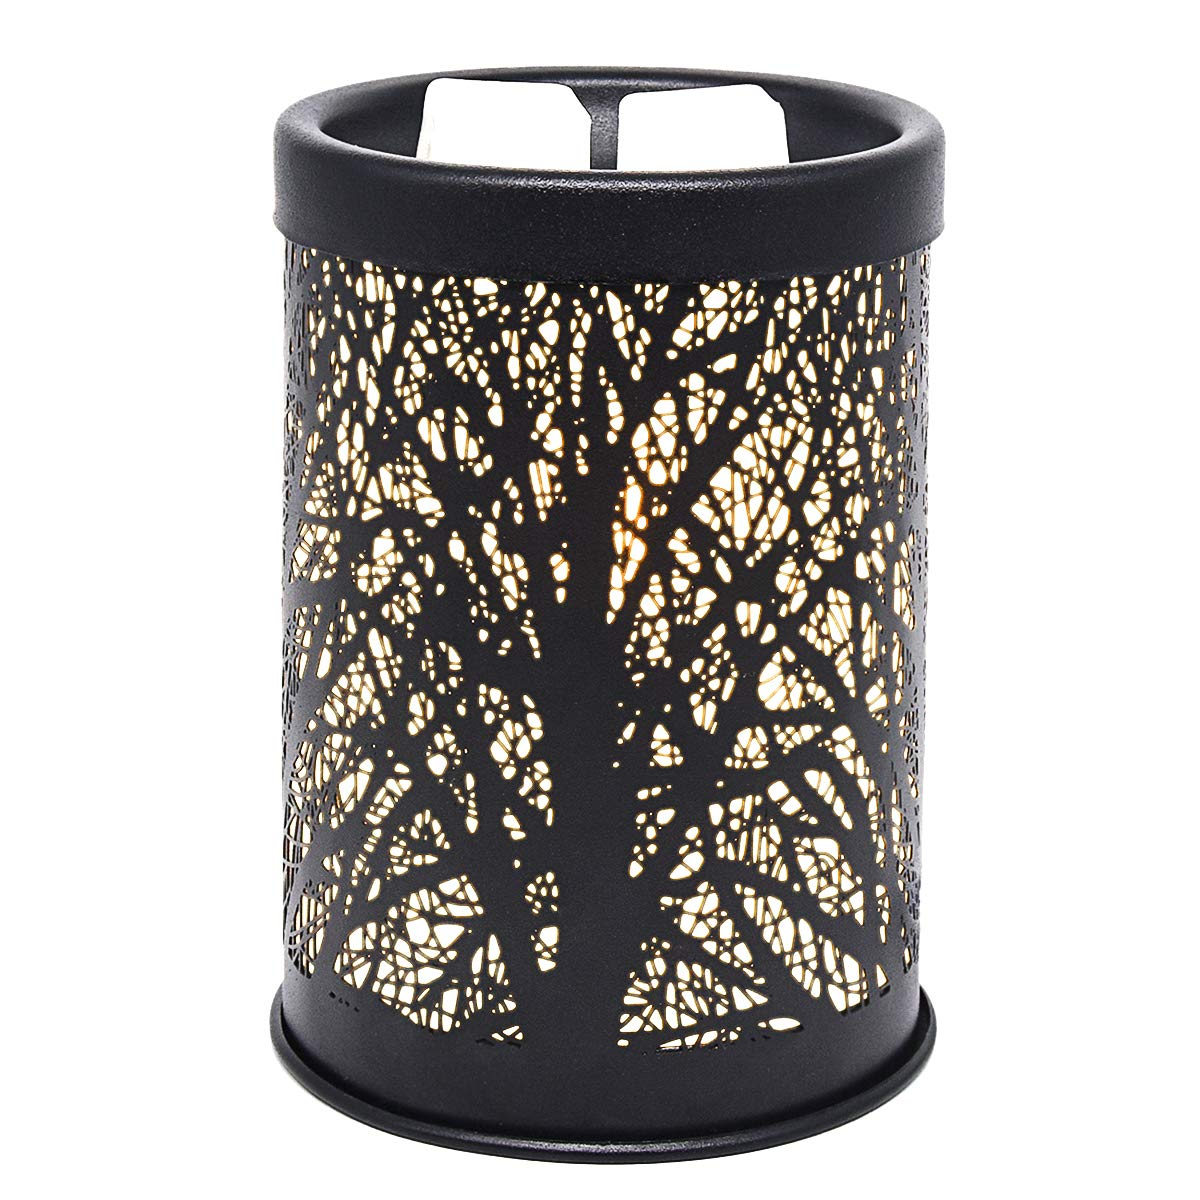 EQUSUPRO Metal Wax Melt Warmer Electric Wax Burner Melter Fragrance Warmer for Home Office Bedroom Living Room Gifts & Decor (Tree)